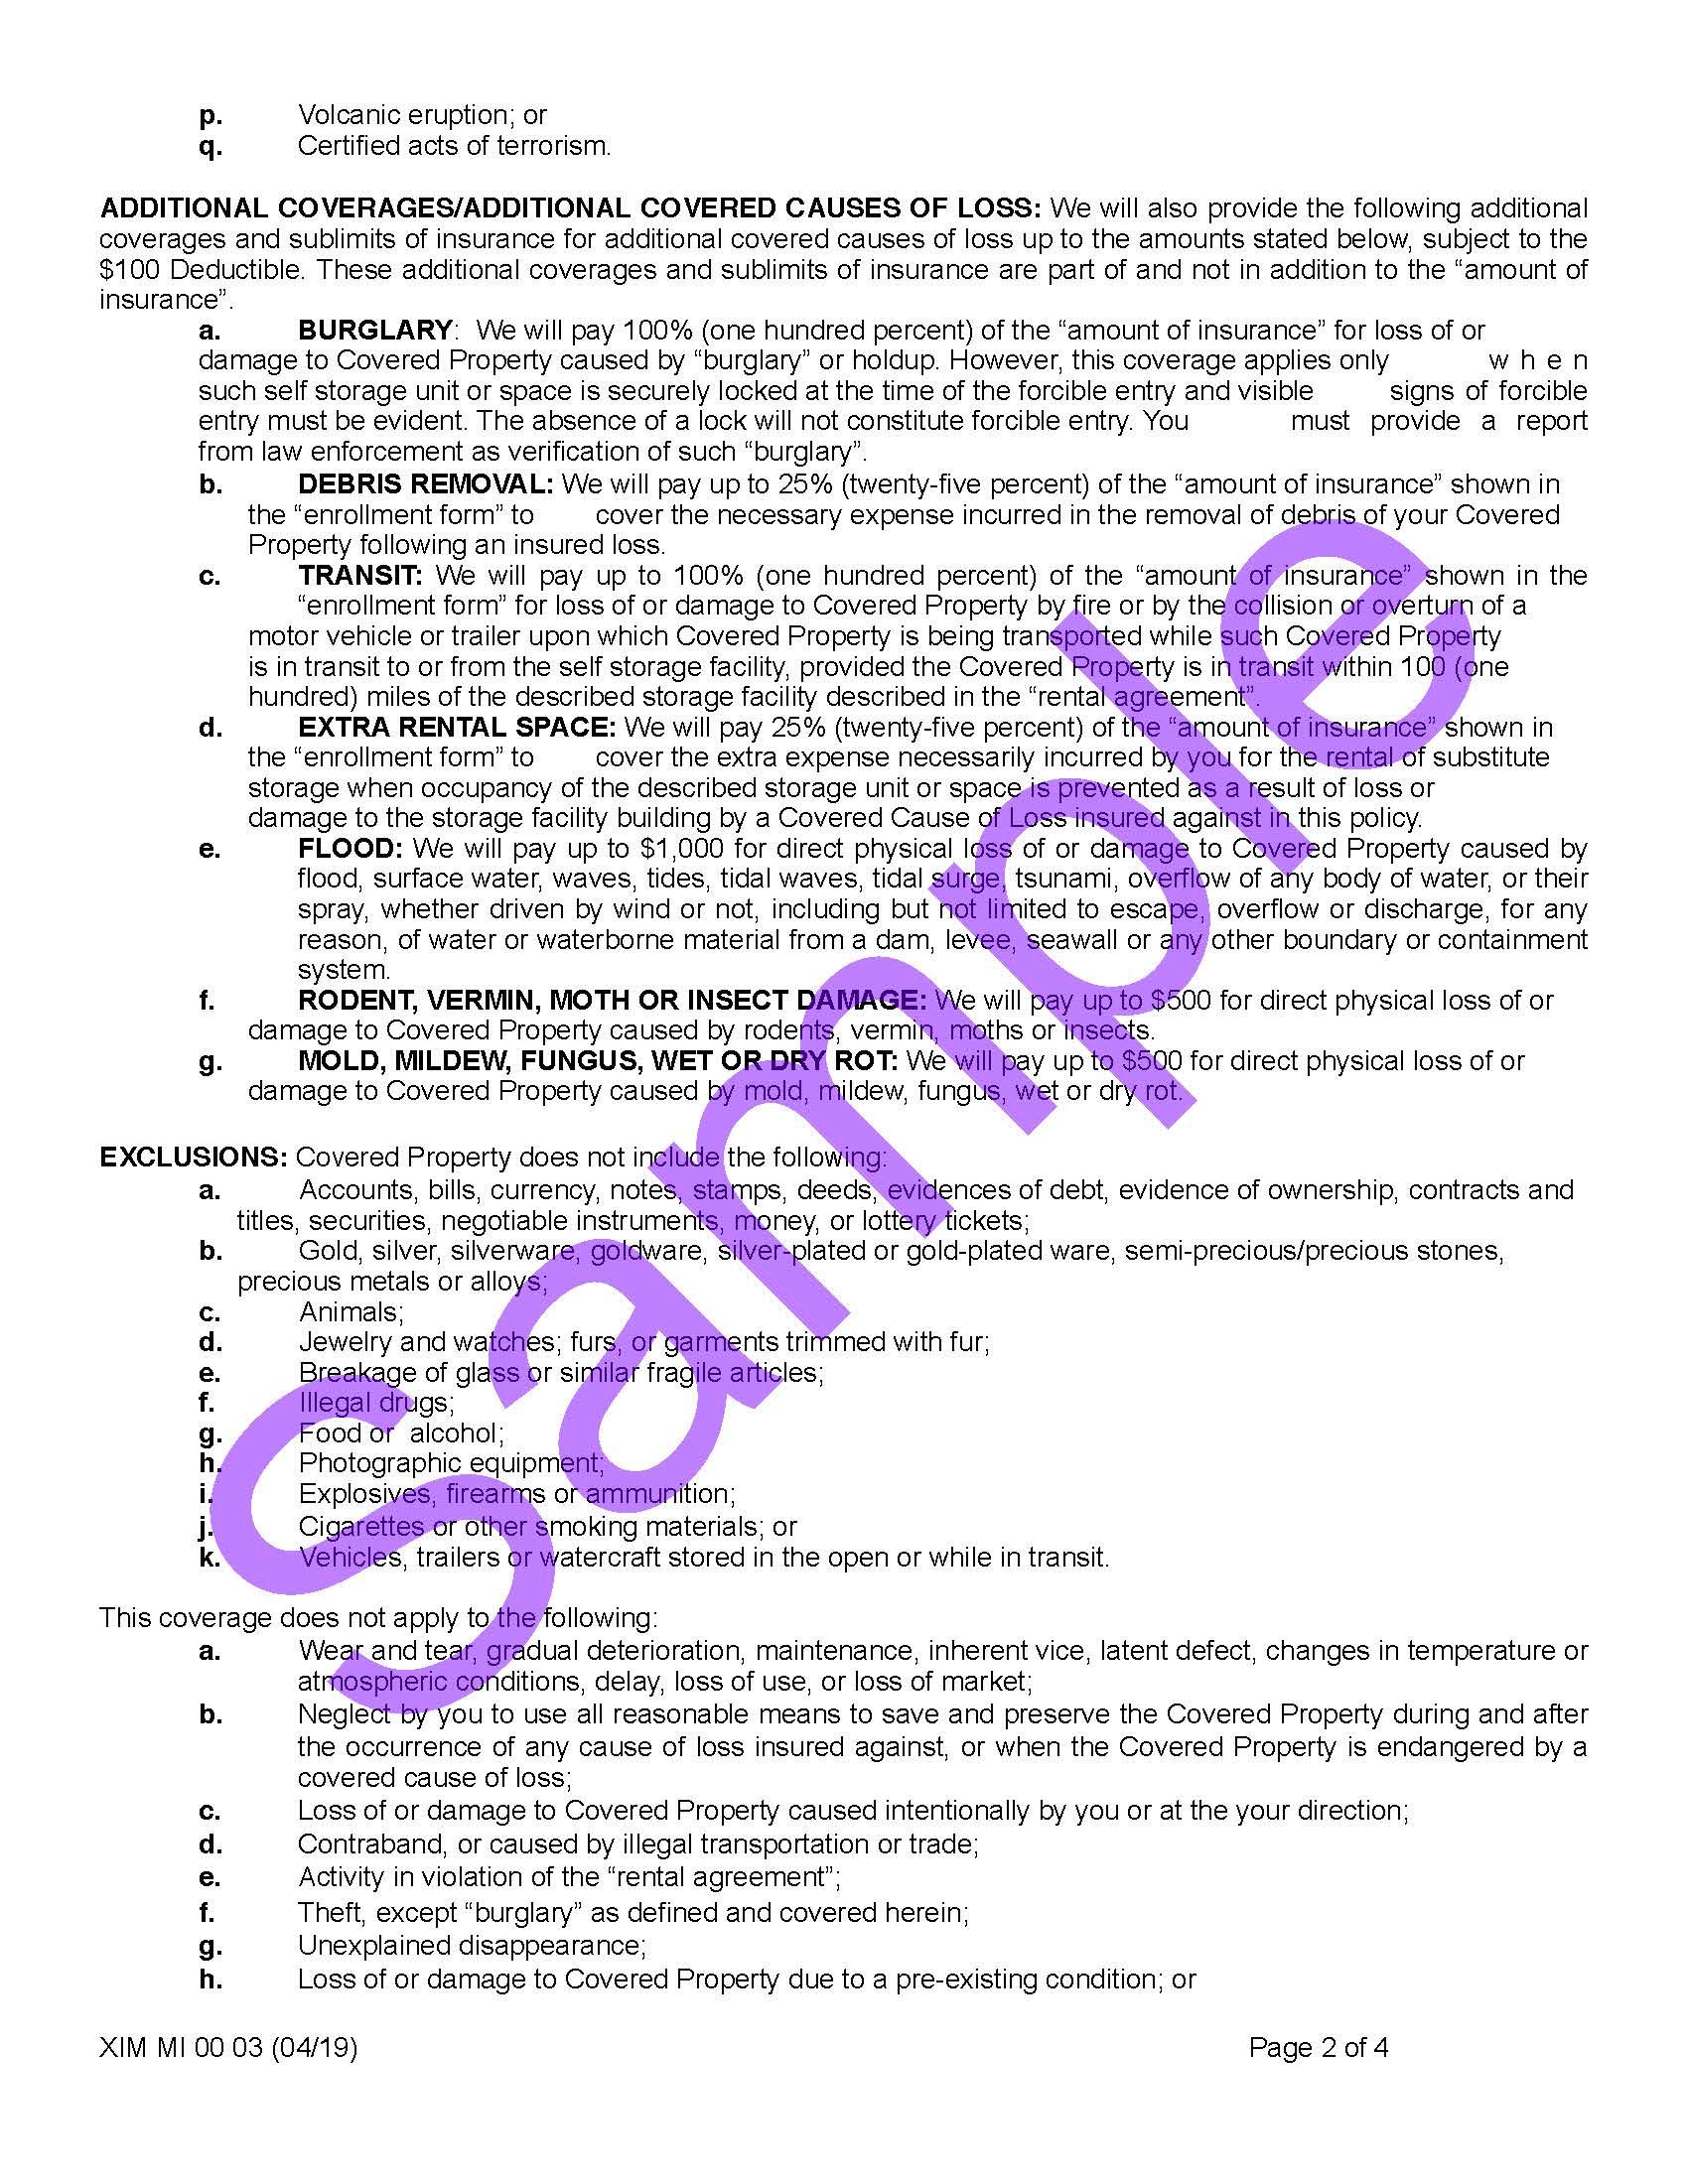 XIM MI 00 03 04 19 Michigan Certificate of InsuranceSample_Page_2.jpg